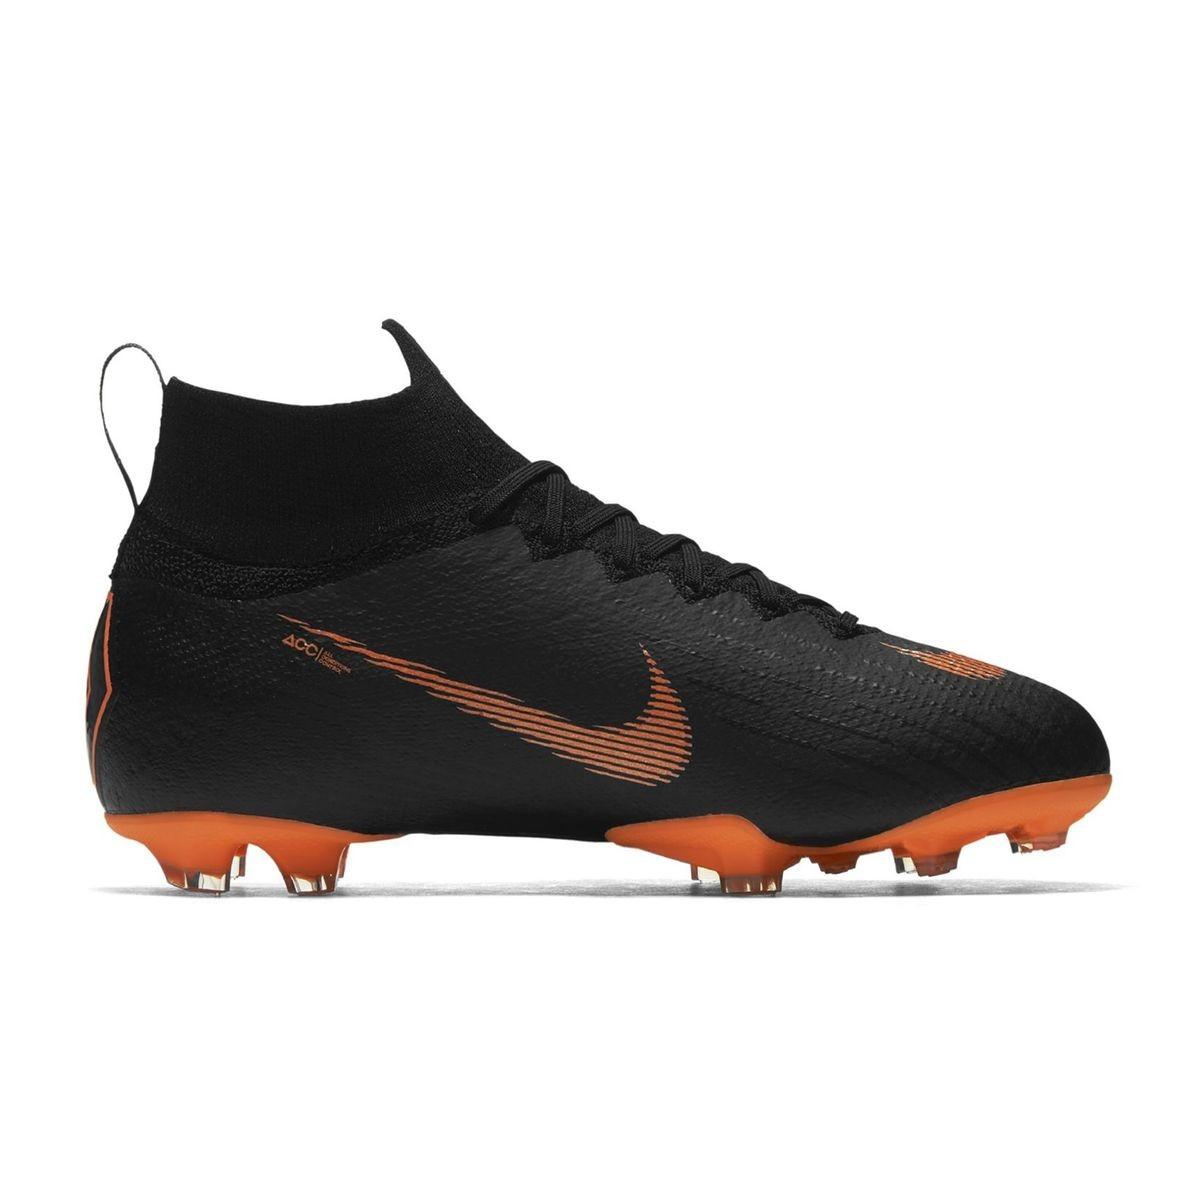 Chaussures Football Chaussure De Football Nike Mercurial